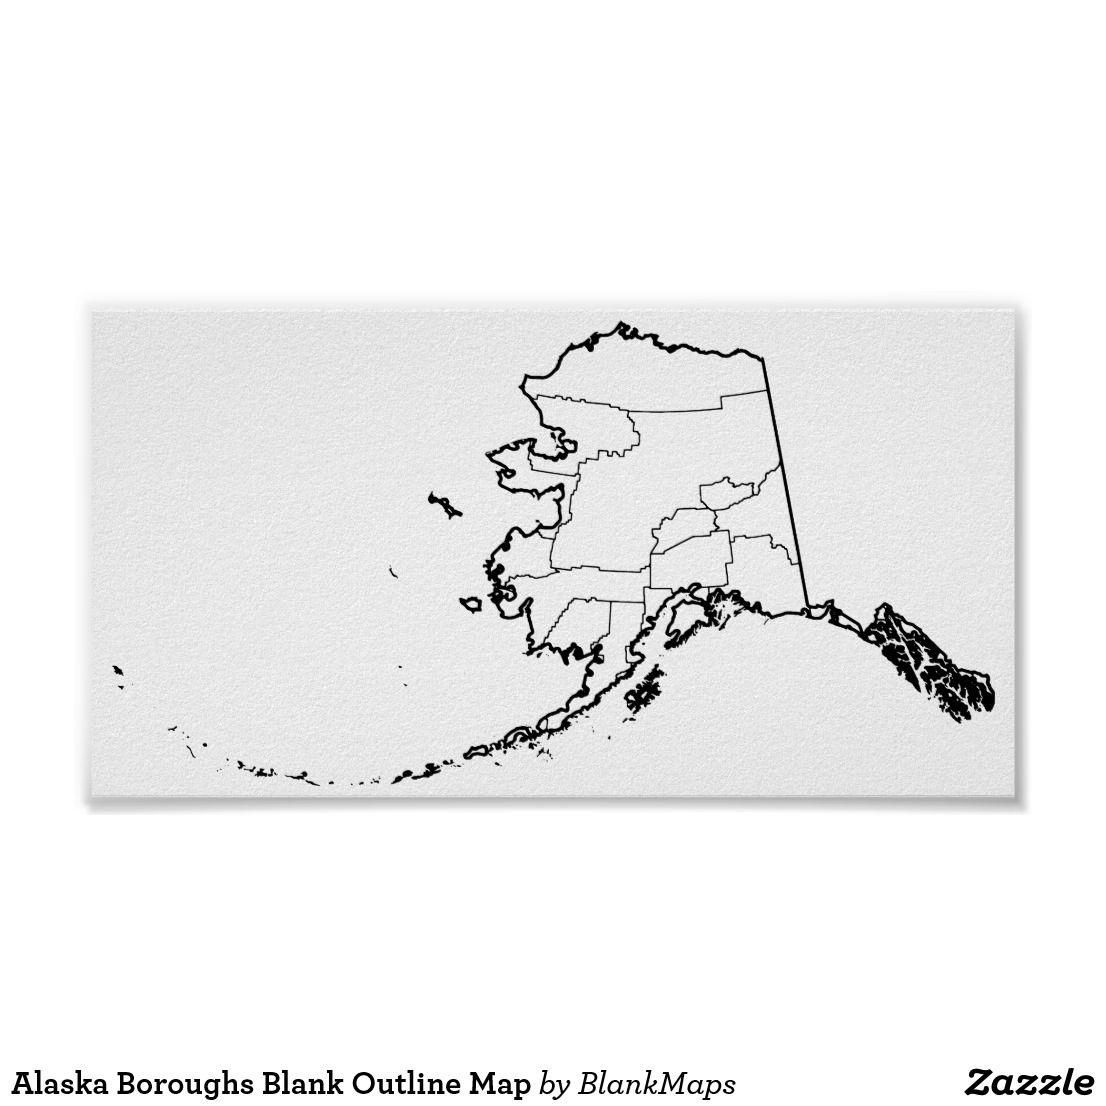 Blank Alaska Map.Alaska Boroughs Blank Outline Map Poster Blank Outline Maps